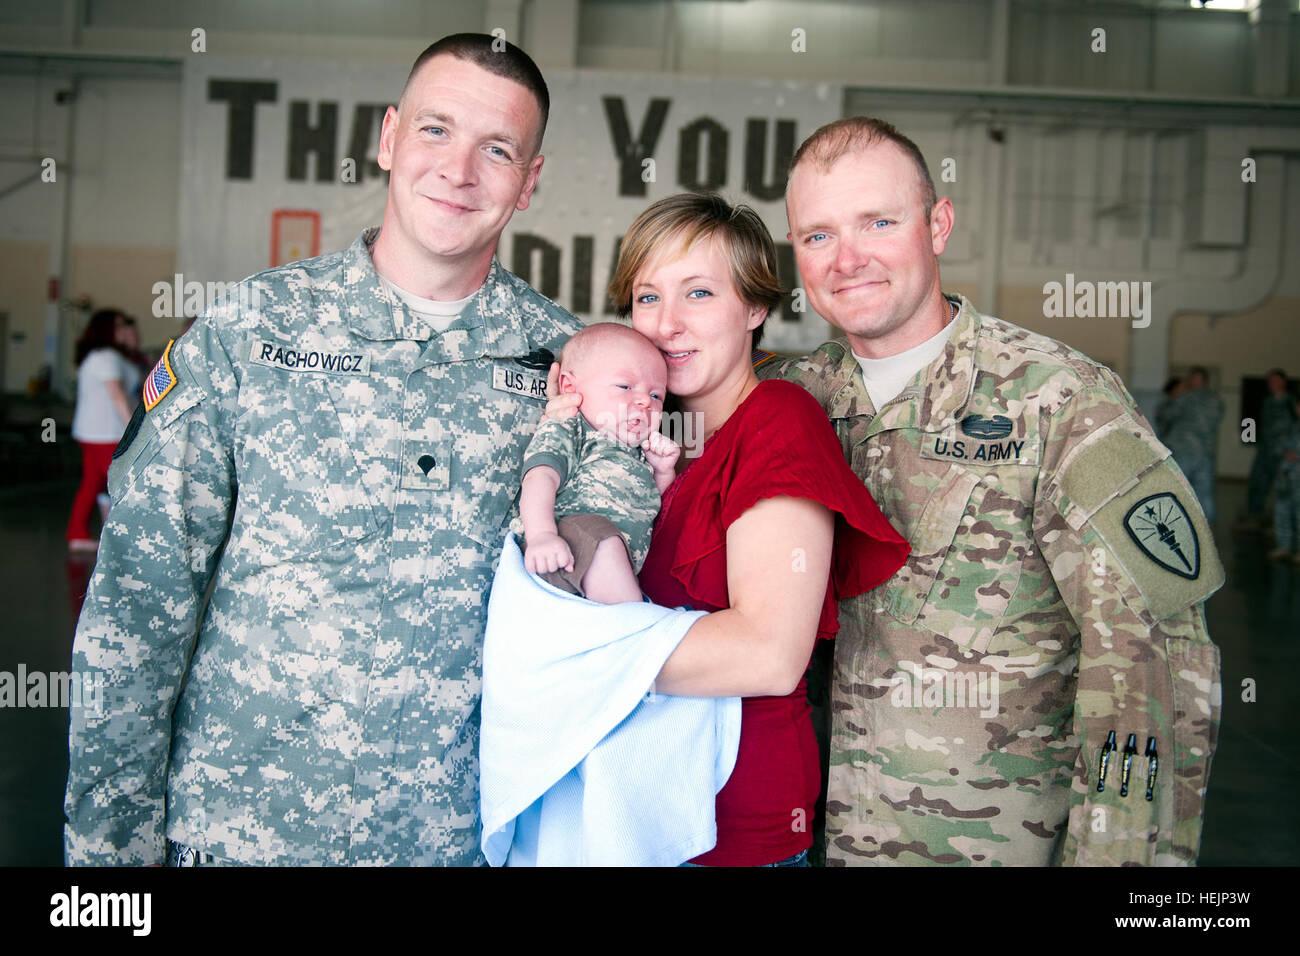 Indiana National Guard Spc. Douglas Rachowicz, wife Amanda Rachowicz, their son Brayden and her brother Sgt. Clinton - Stock Image